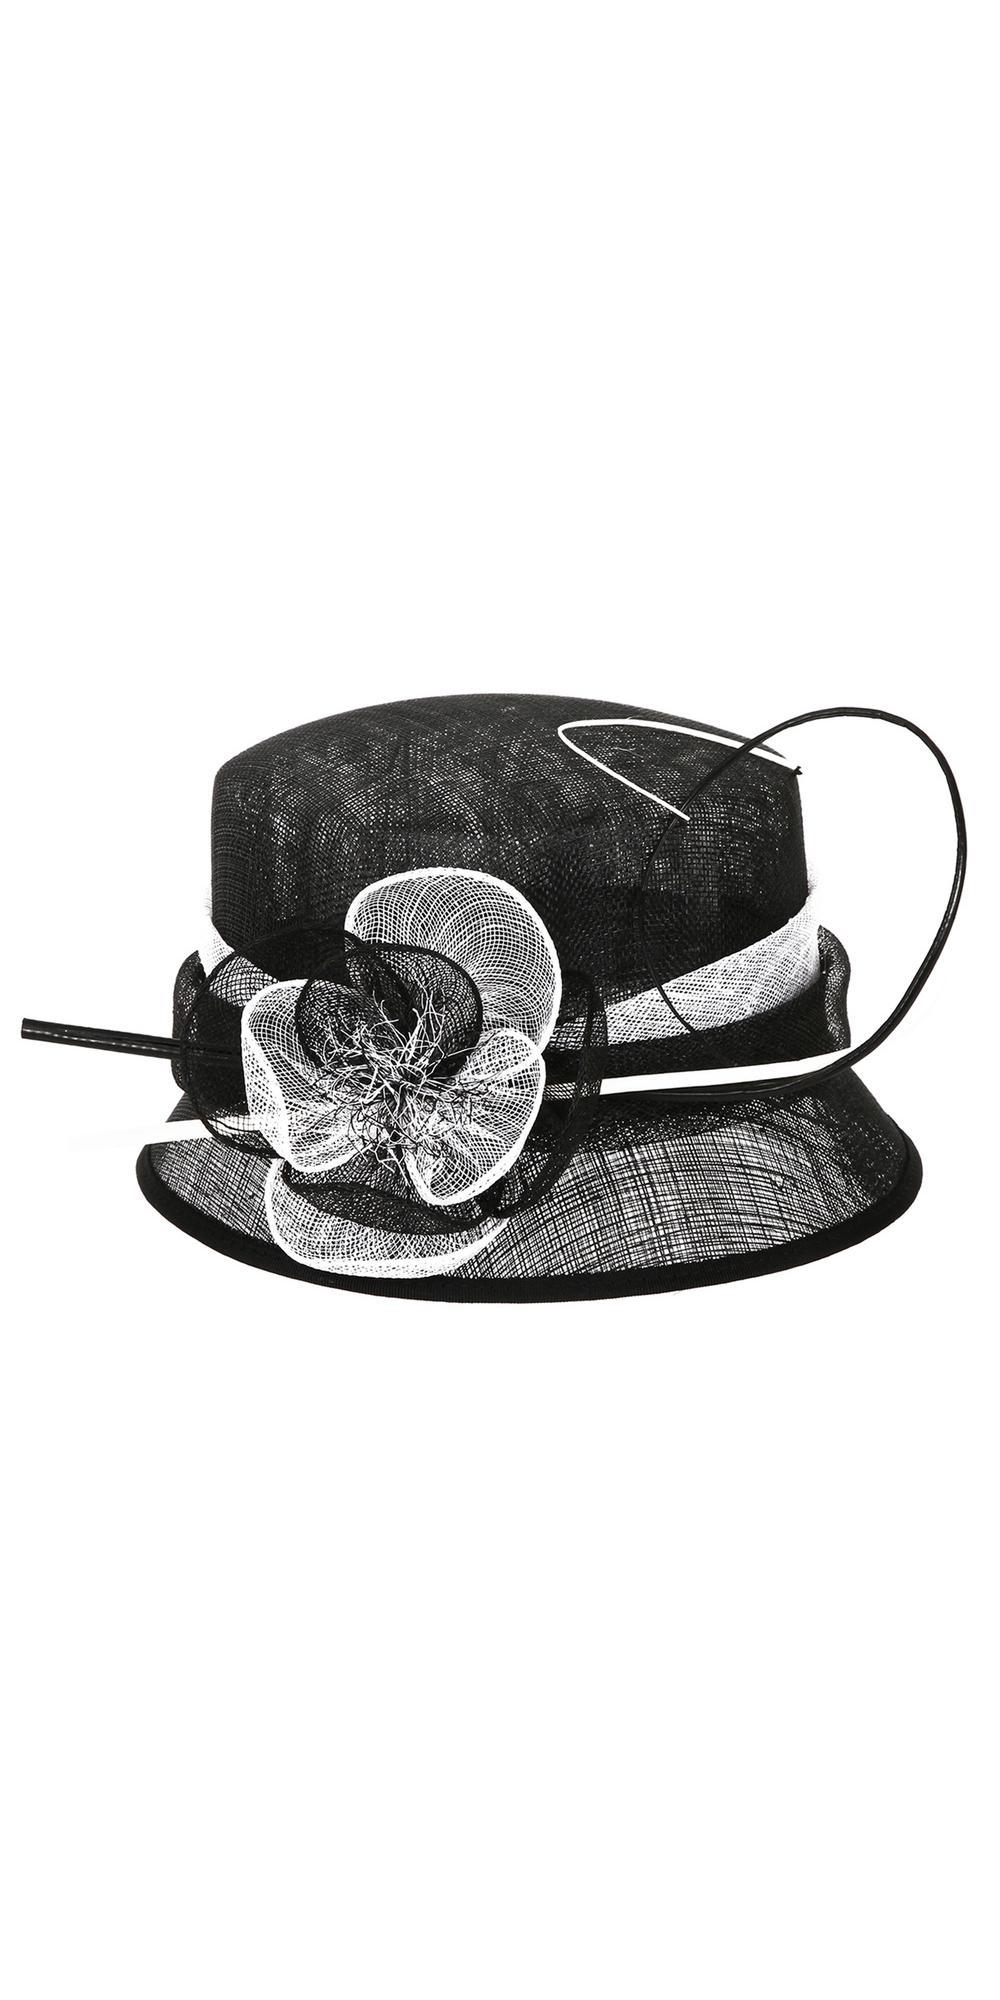 1920s Cloche Sinamay Hat in Black White. Loading zoom edf51fe5f02